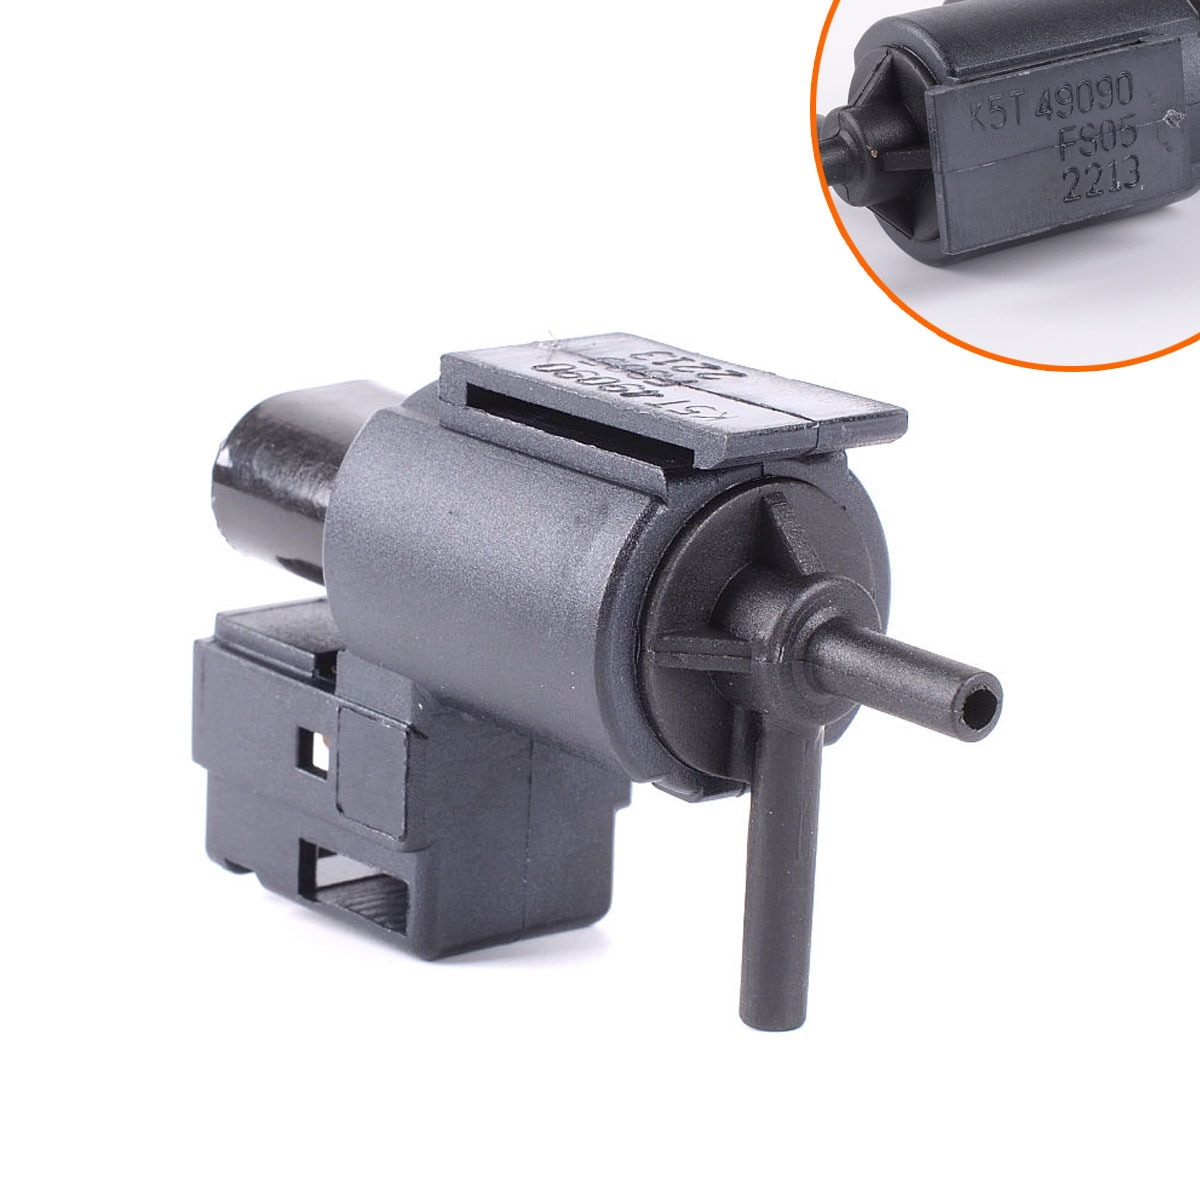 Adecuado para la válvula de solenoide de la válvula de aire Mazda adaptador de la válvula de deflación del interruptor de vacío egRX-8 Disciples MPV Vs55